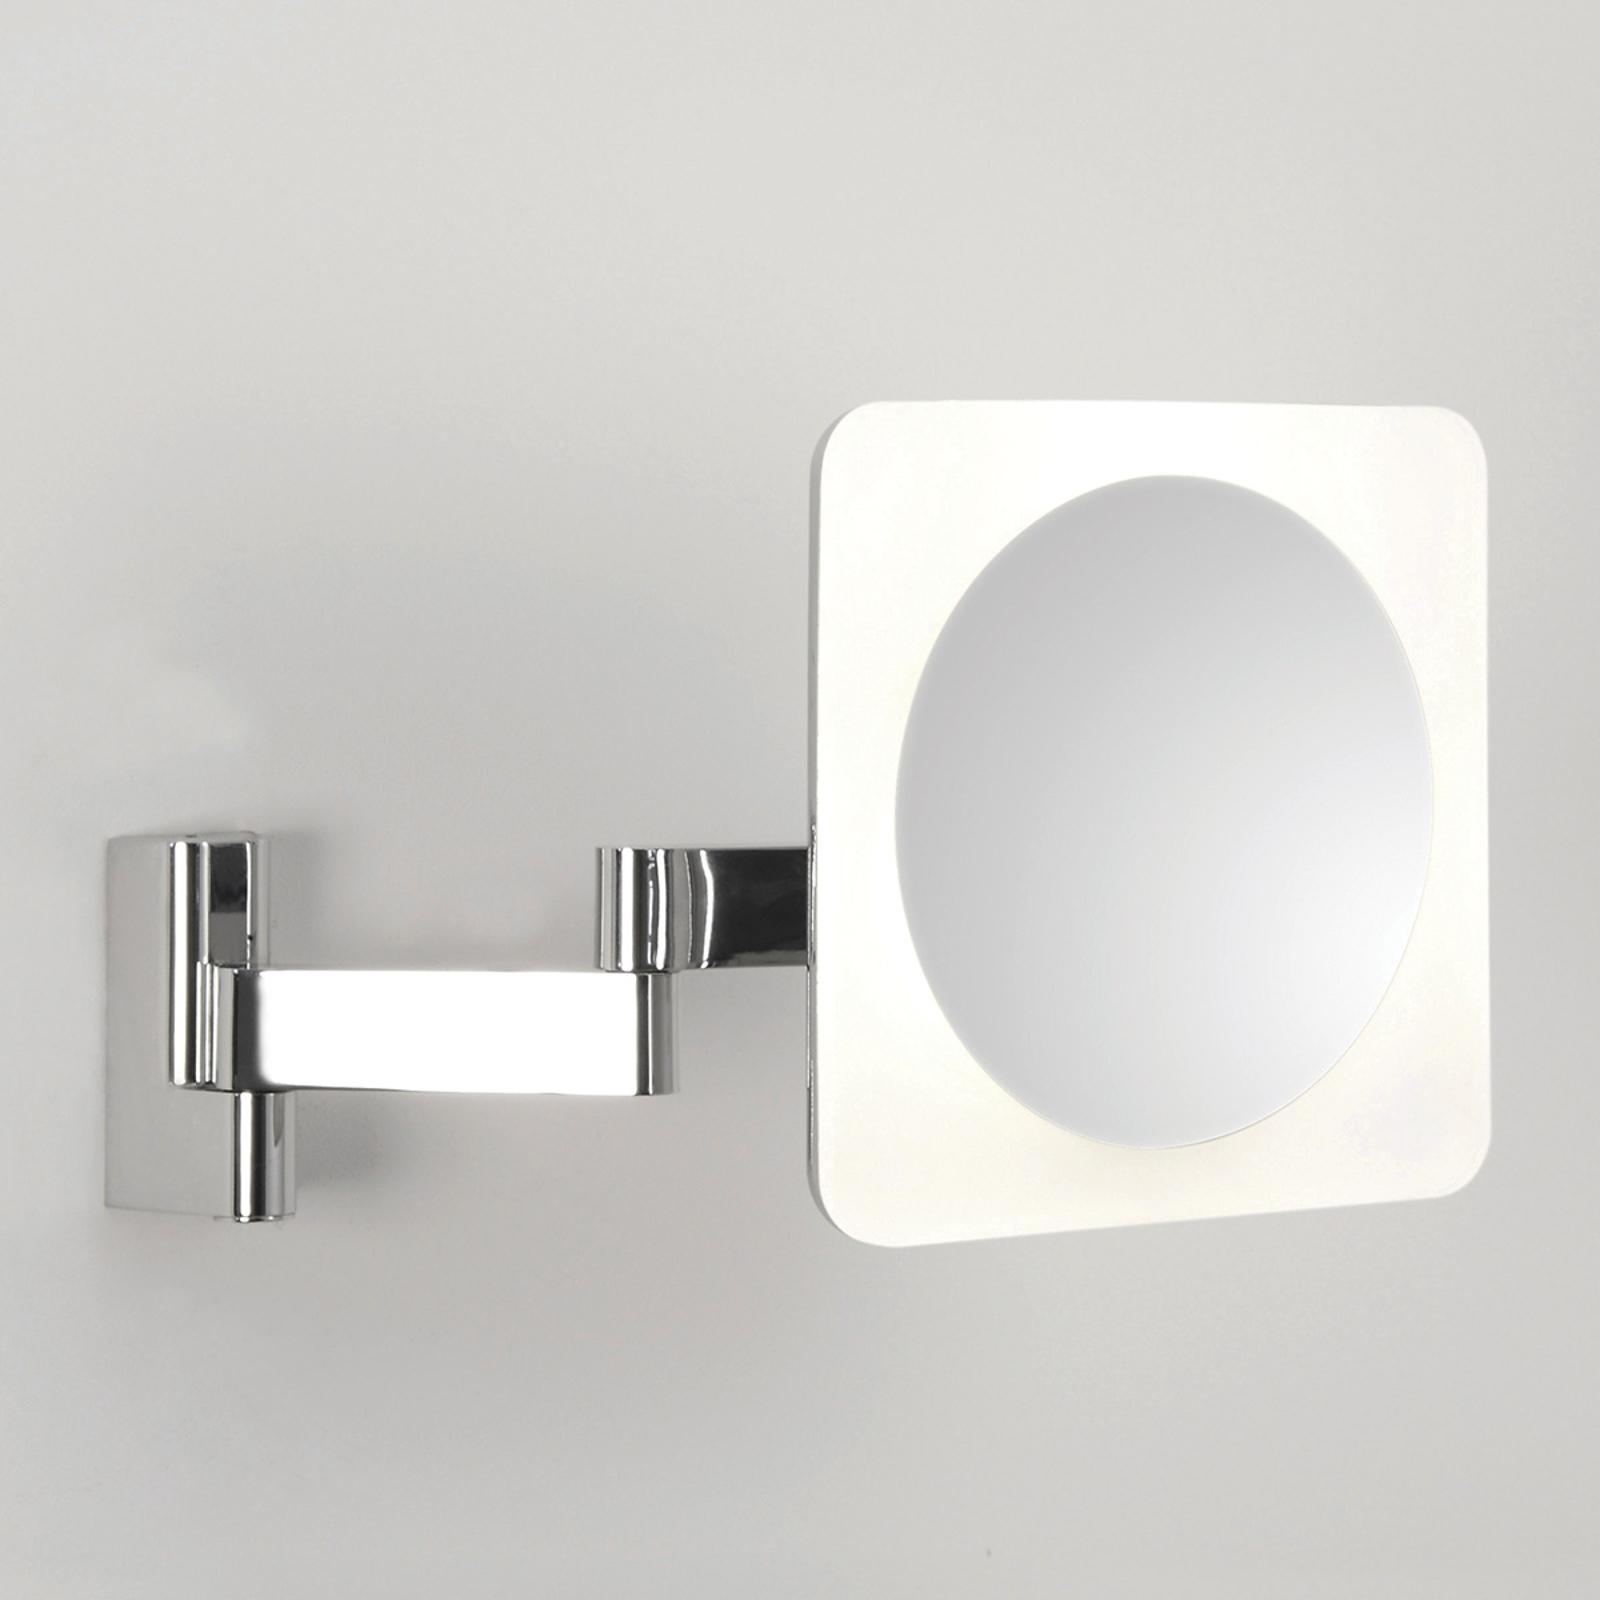 Niimi Square LED Mirror 5x Magnification_1020377_1